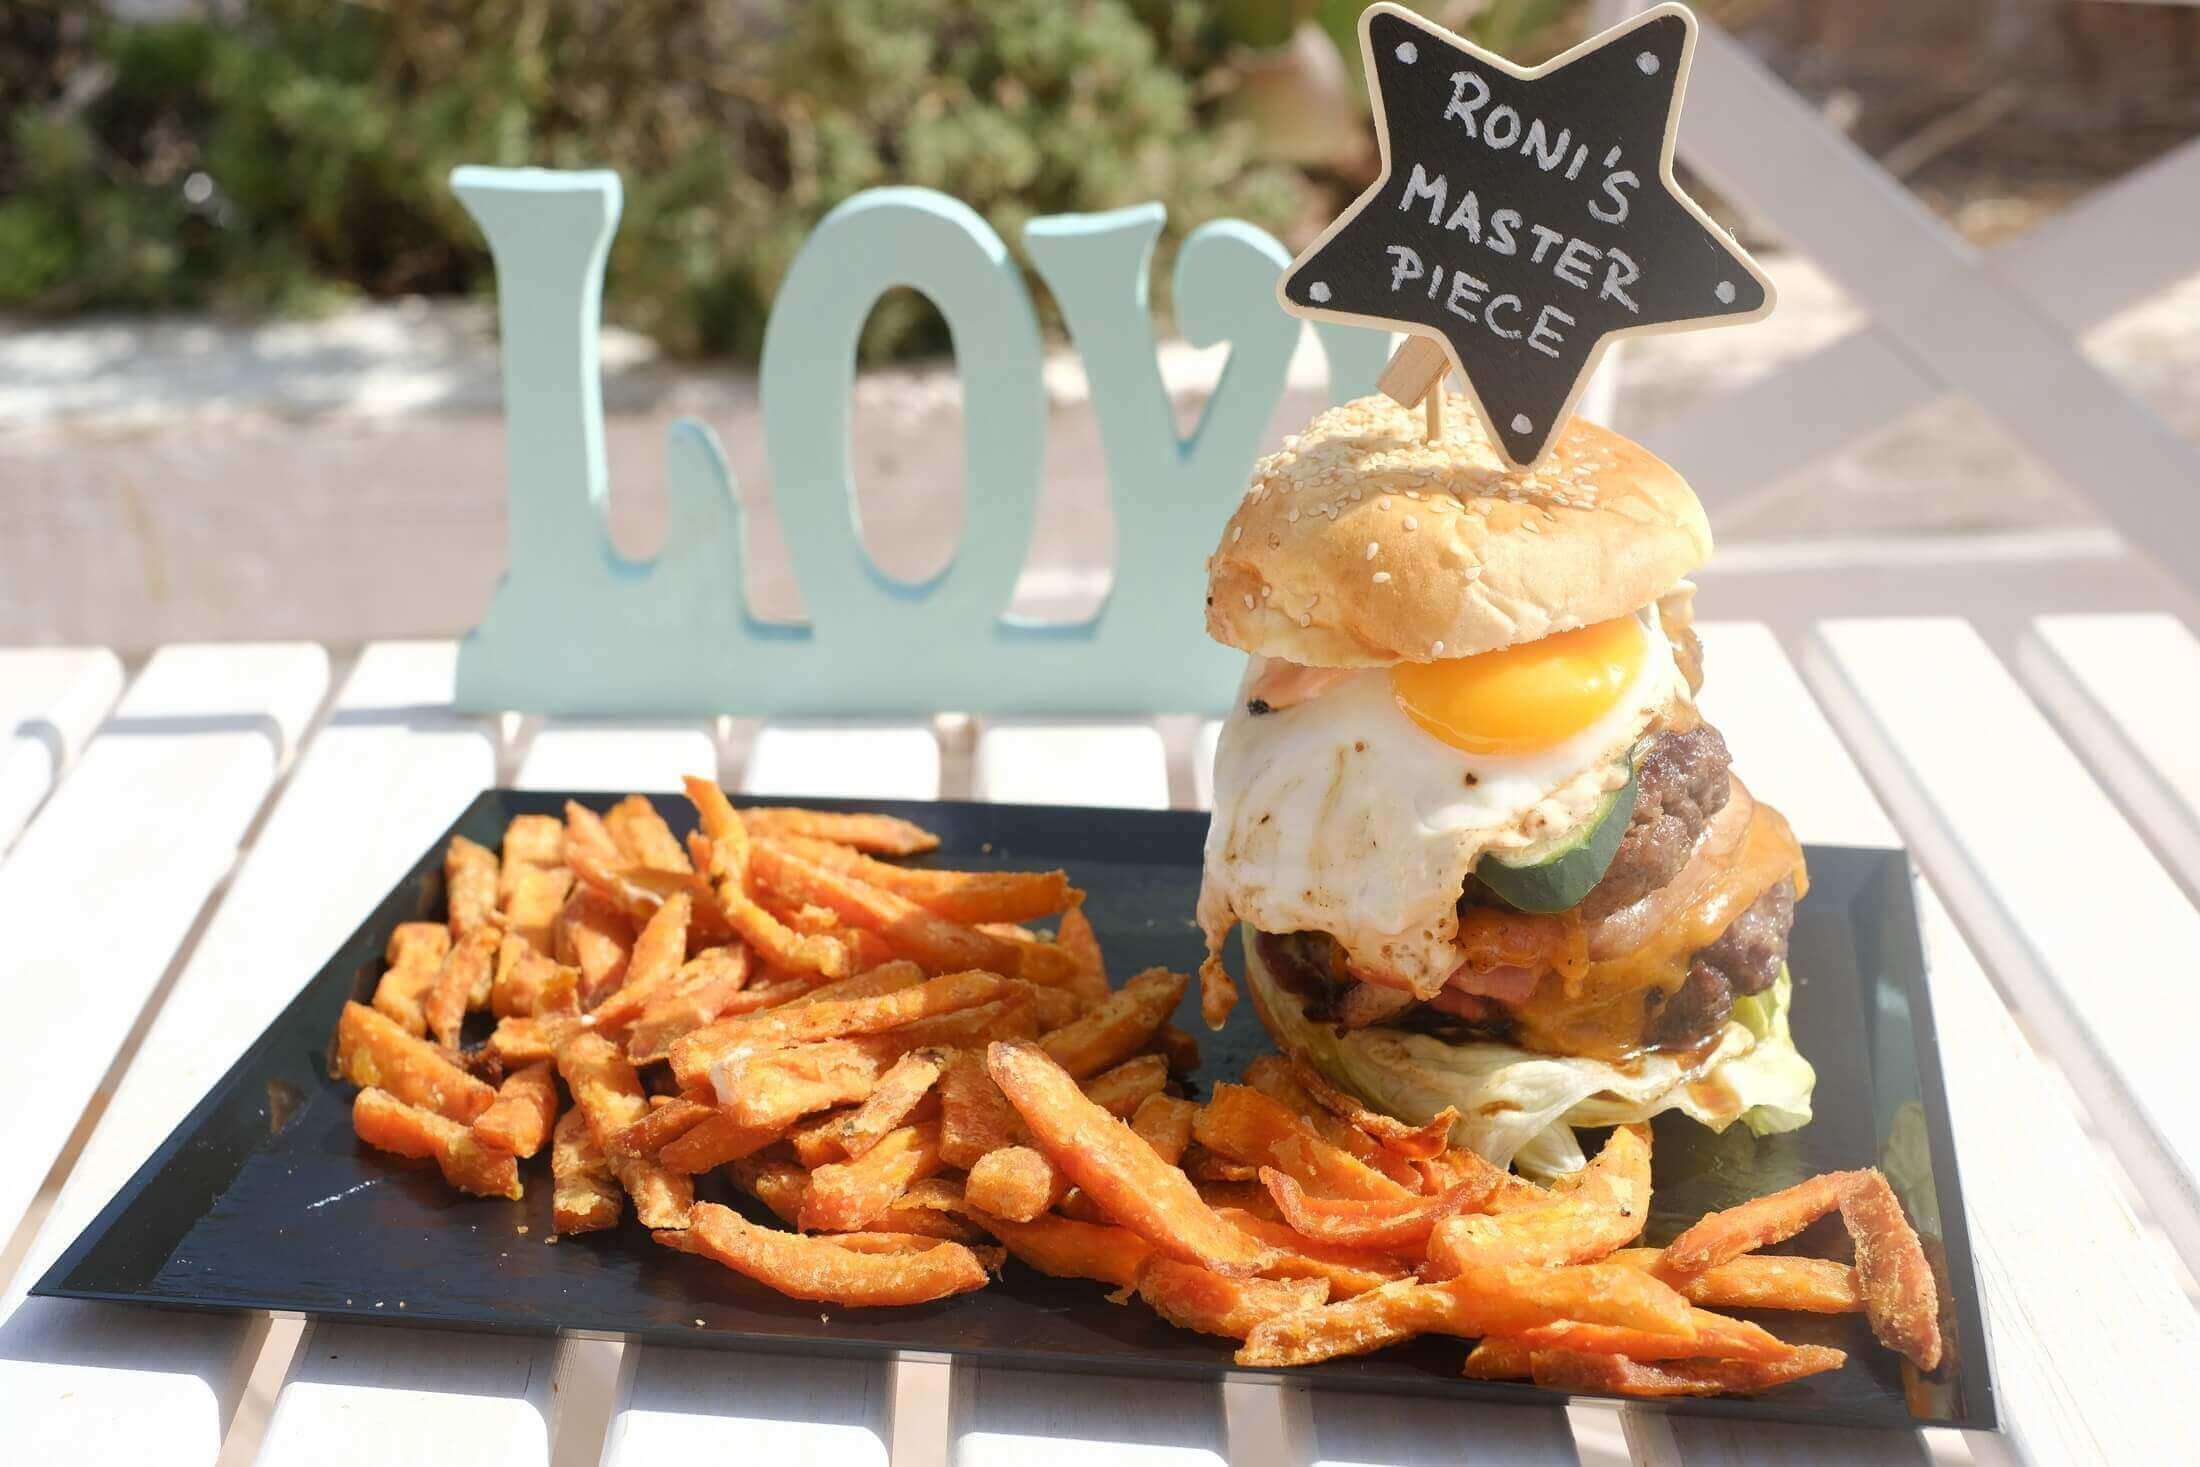 burger-ibiza-ronis-masterpiece